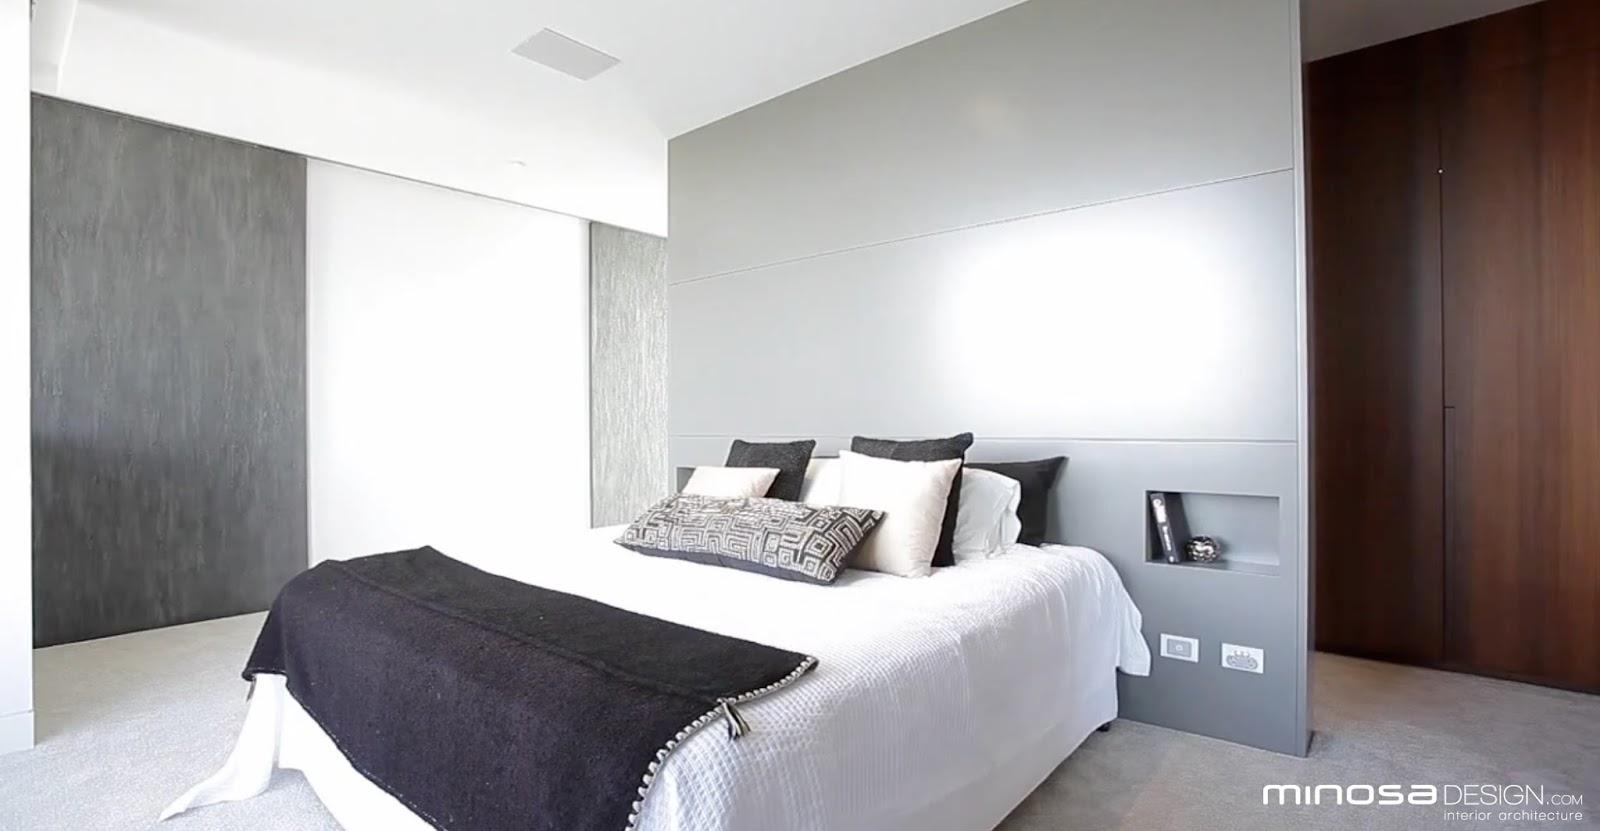 Minosa new minosa bathroom design resort style ensuite - Brand New Architectural Masterpiece